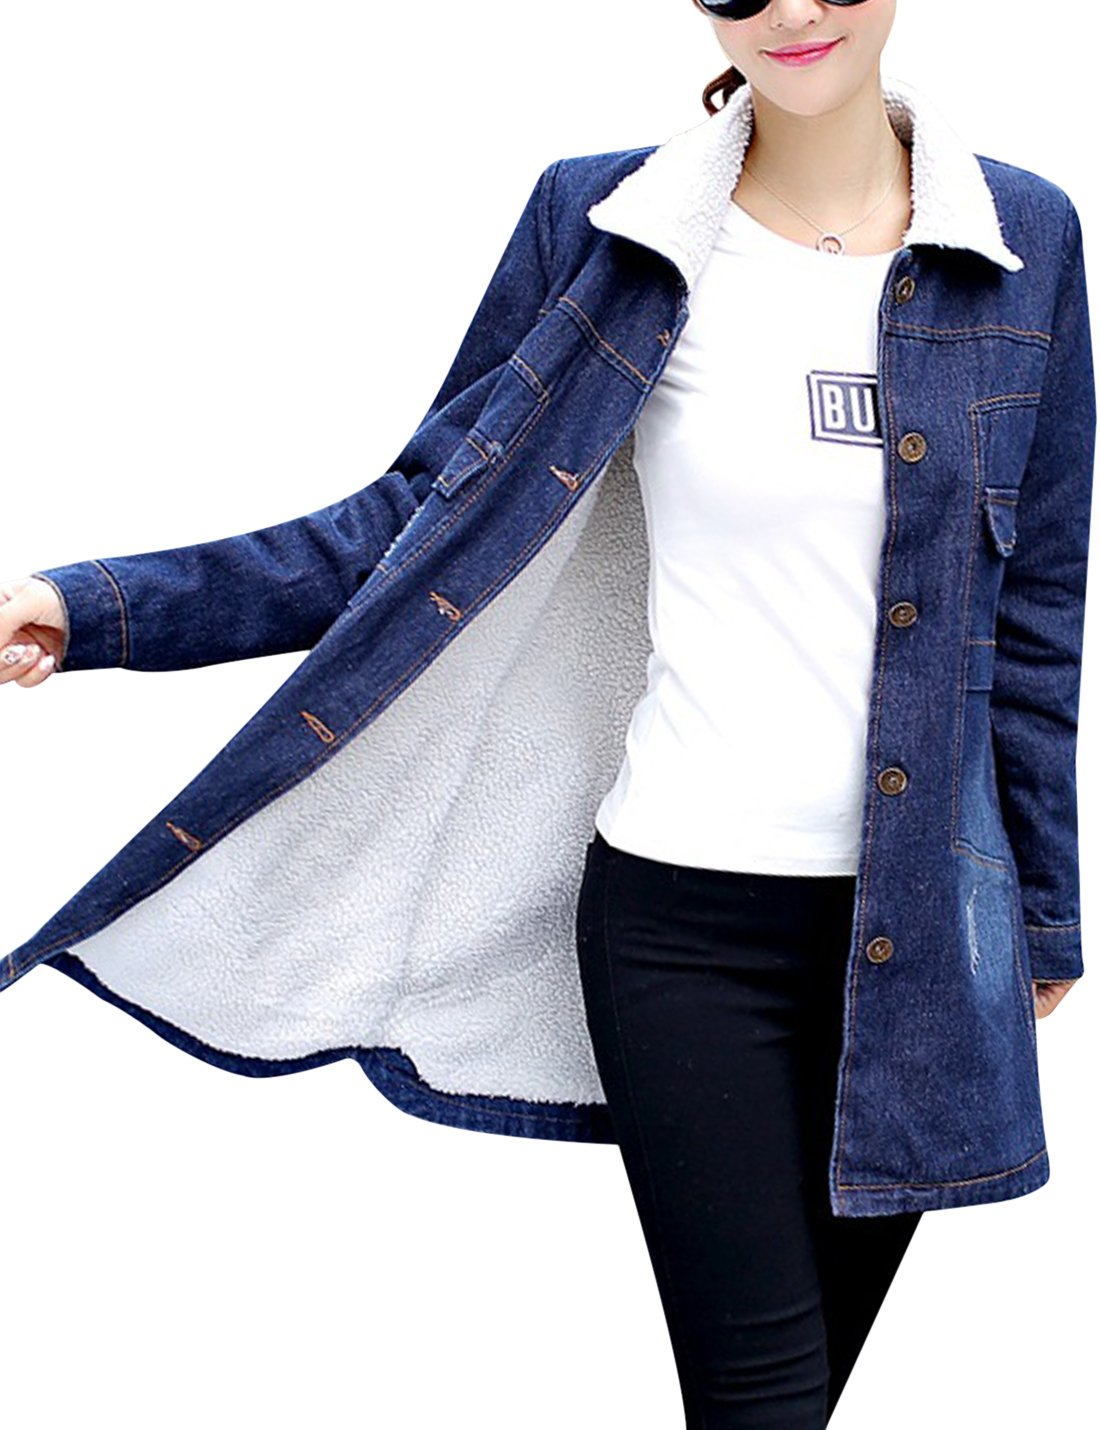 Tanming Women's Warm Sherpa Lined Long Denim Jean Jacket Outerwear (Blue White, X-Large)